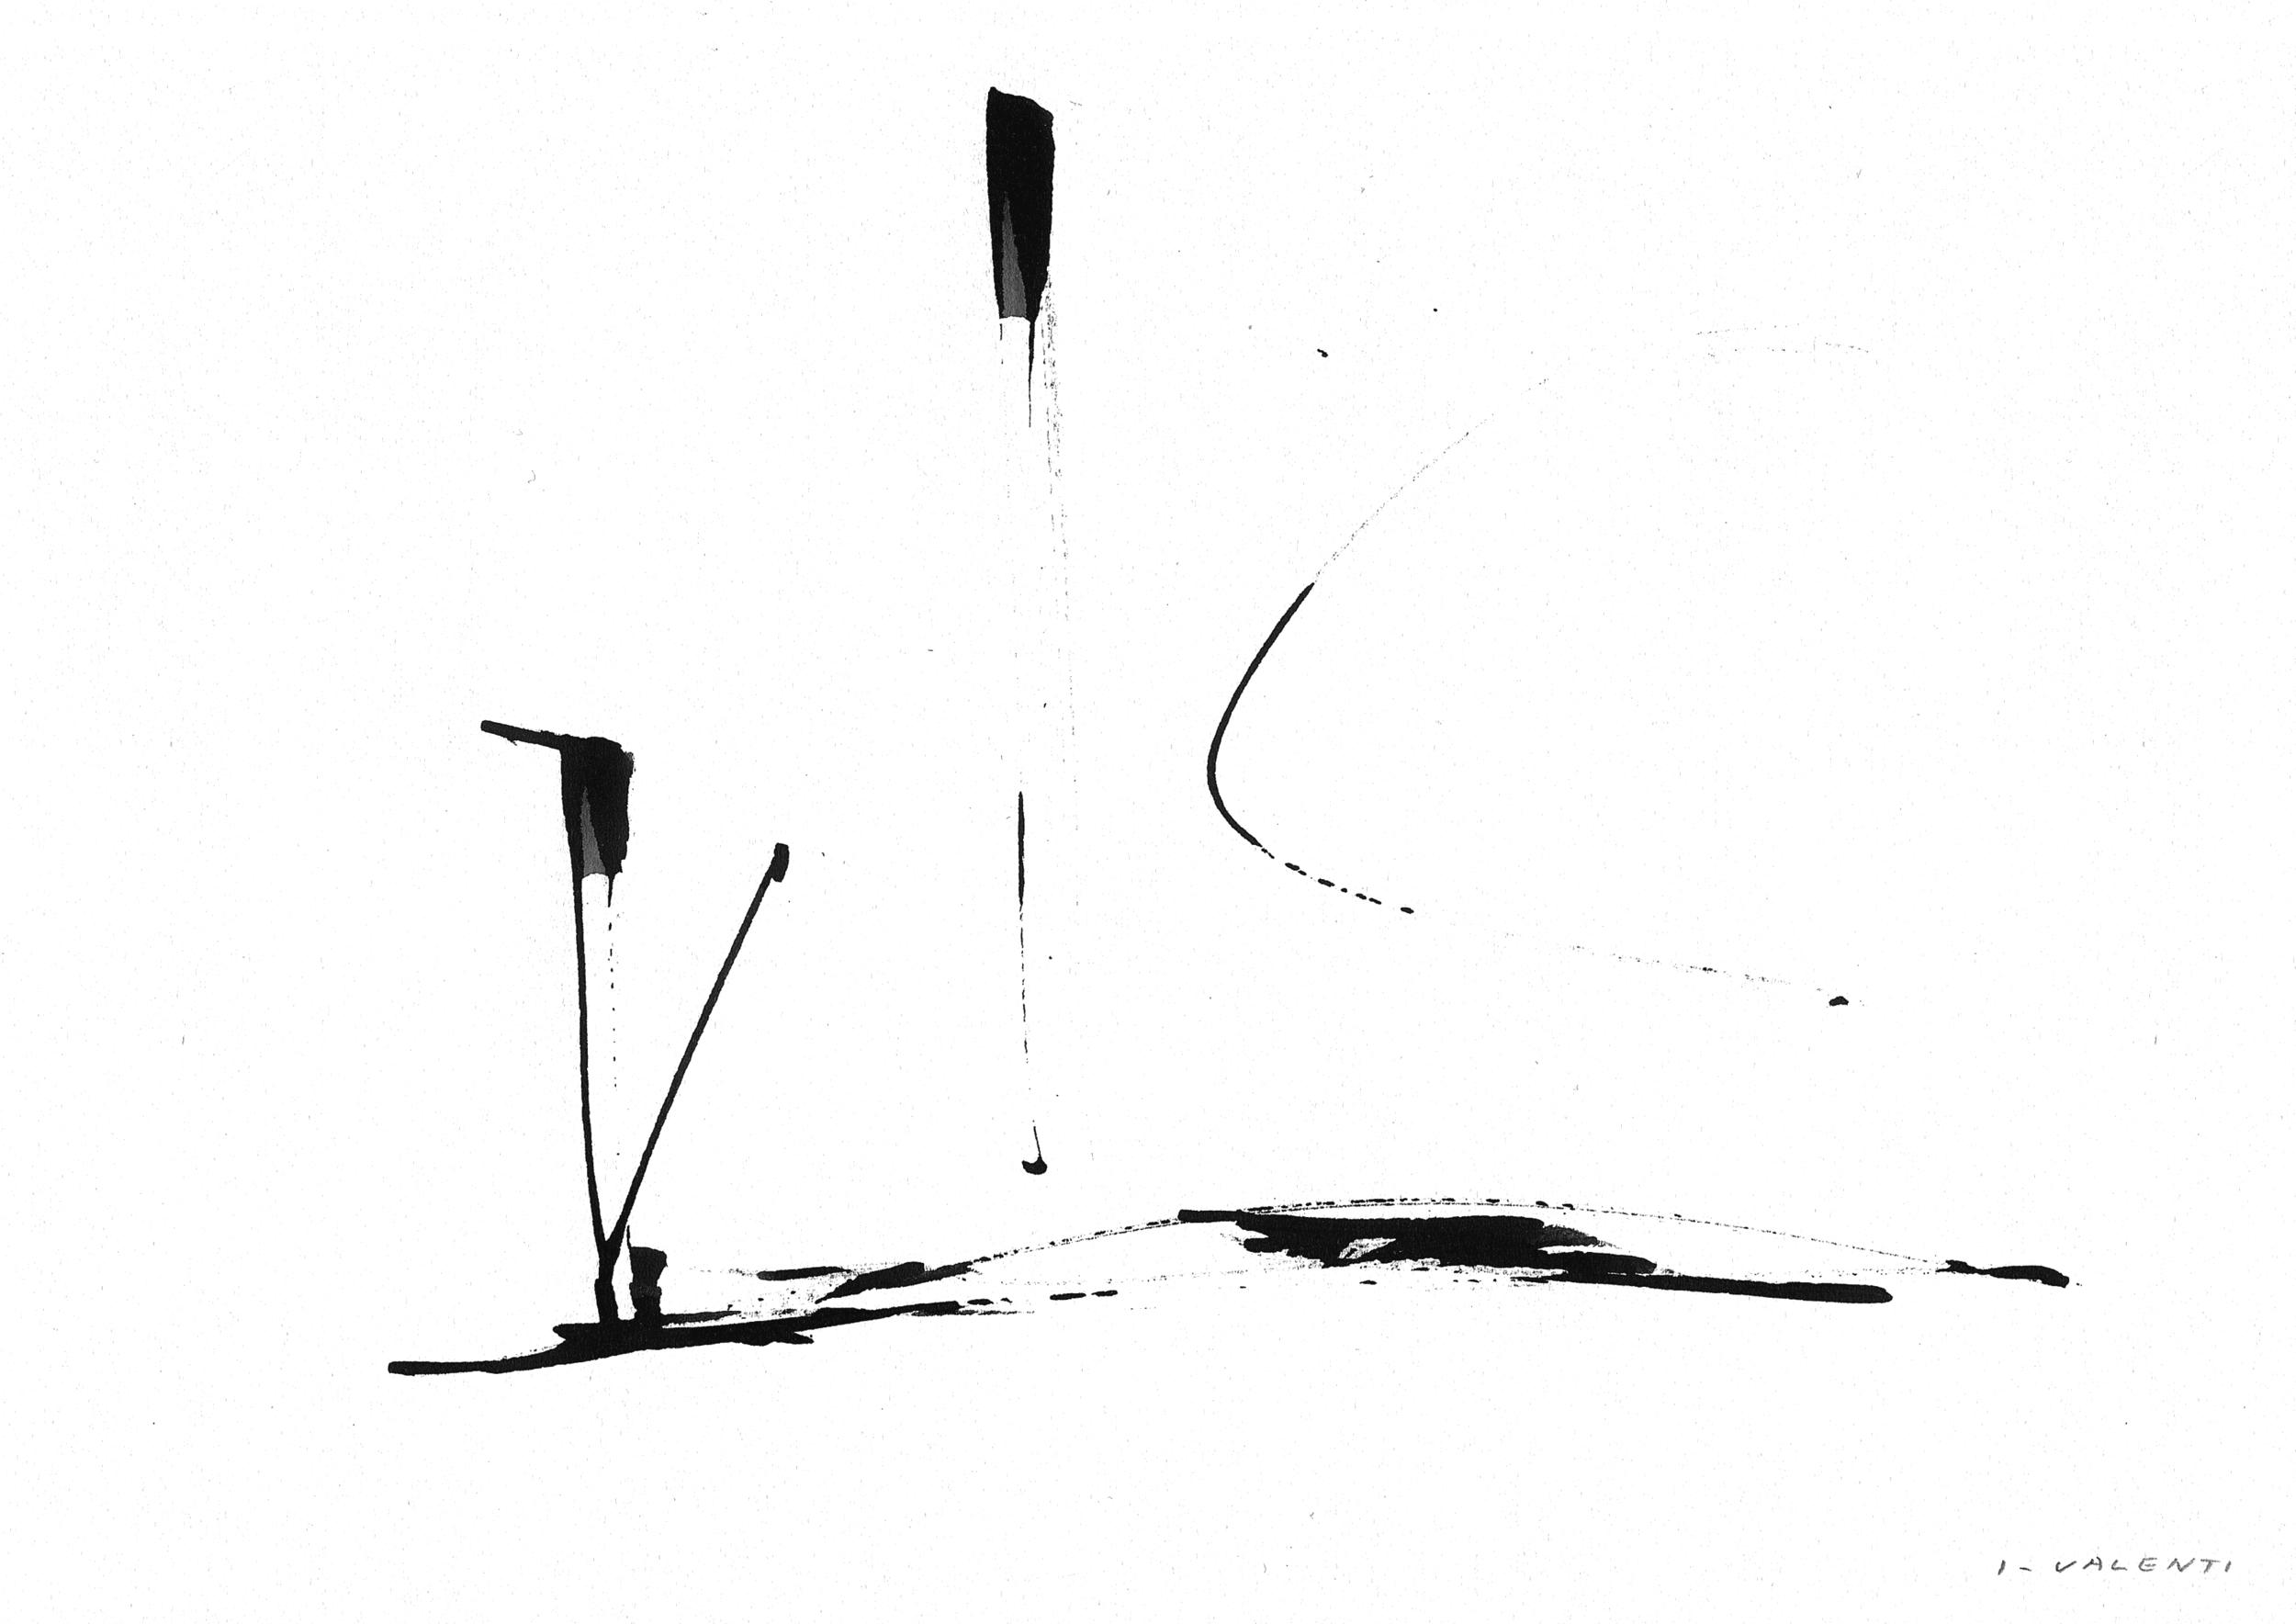 Jeux 1977 cm 21x29,5 Inchiostro di china su carta.jpg